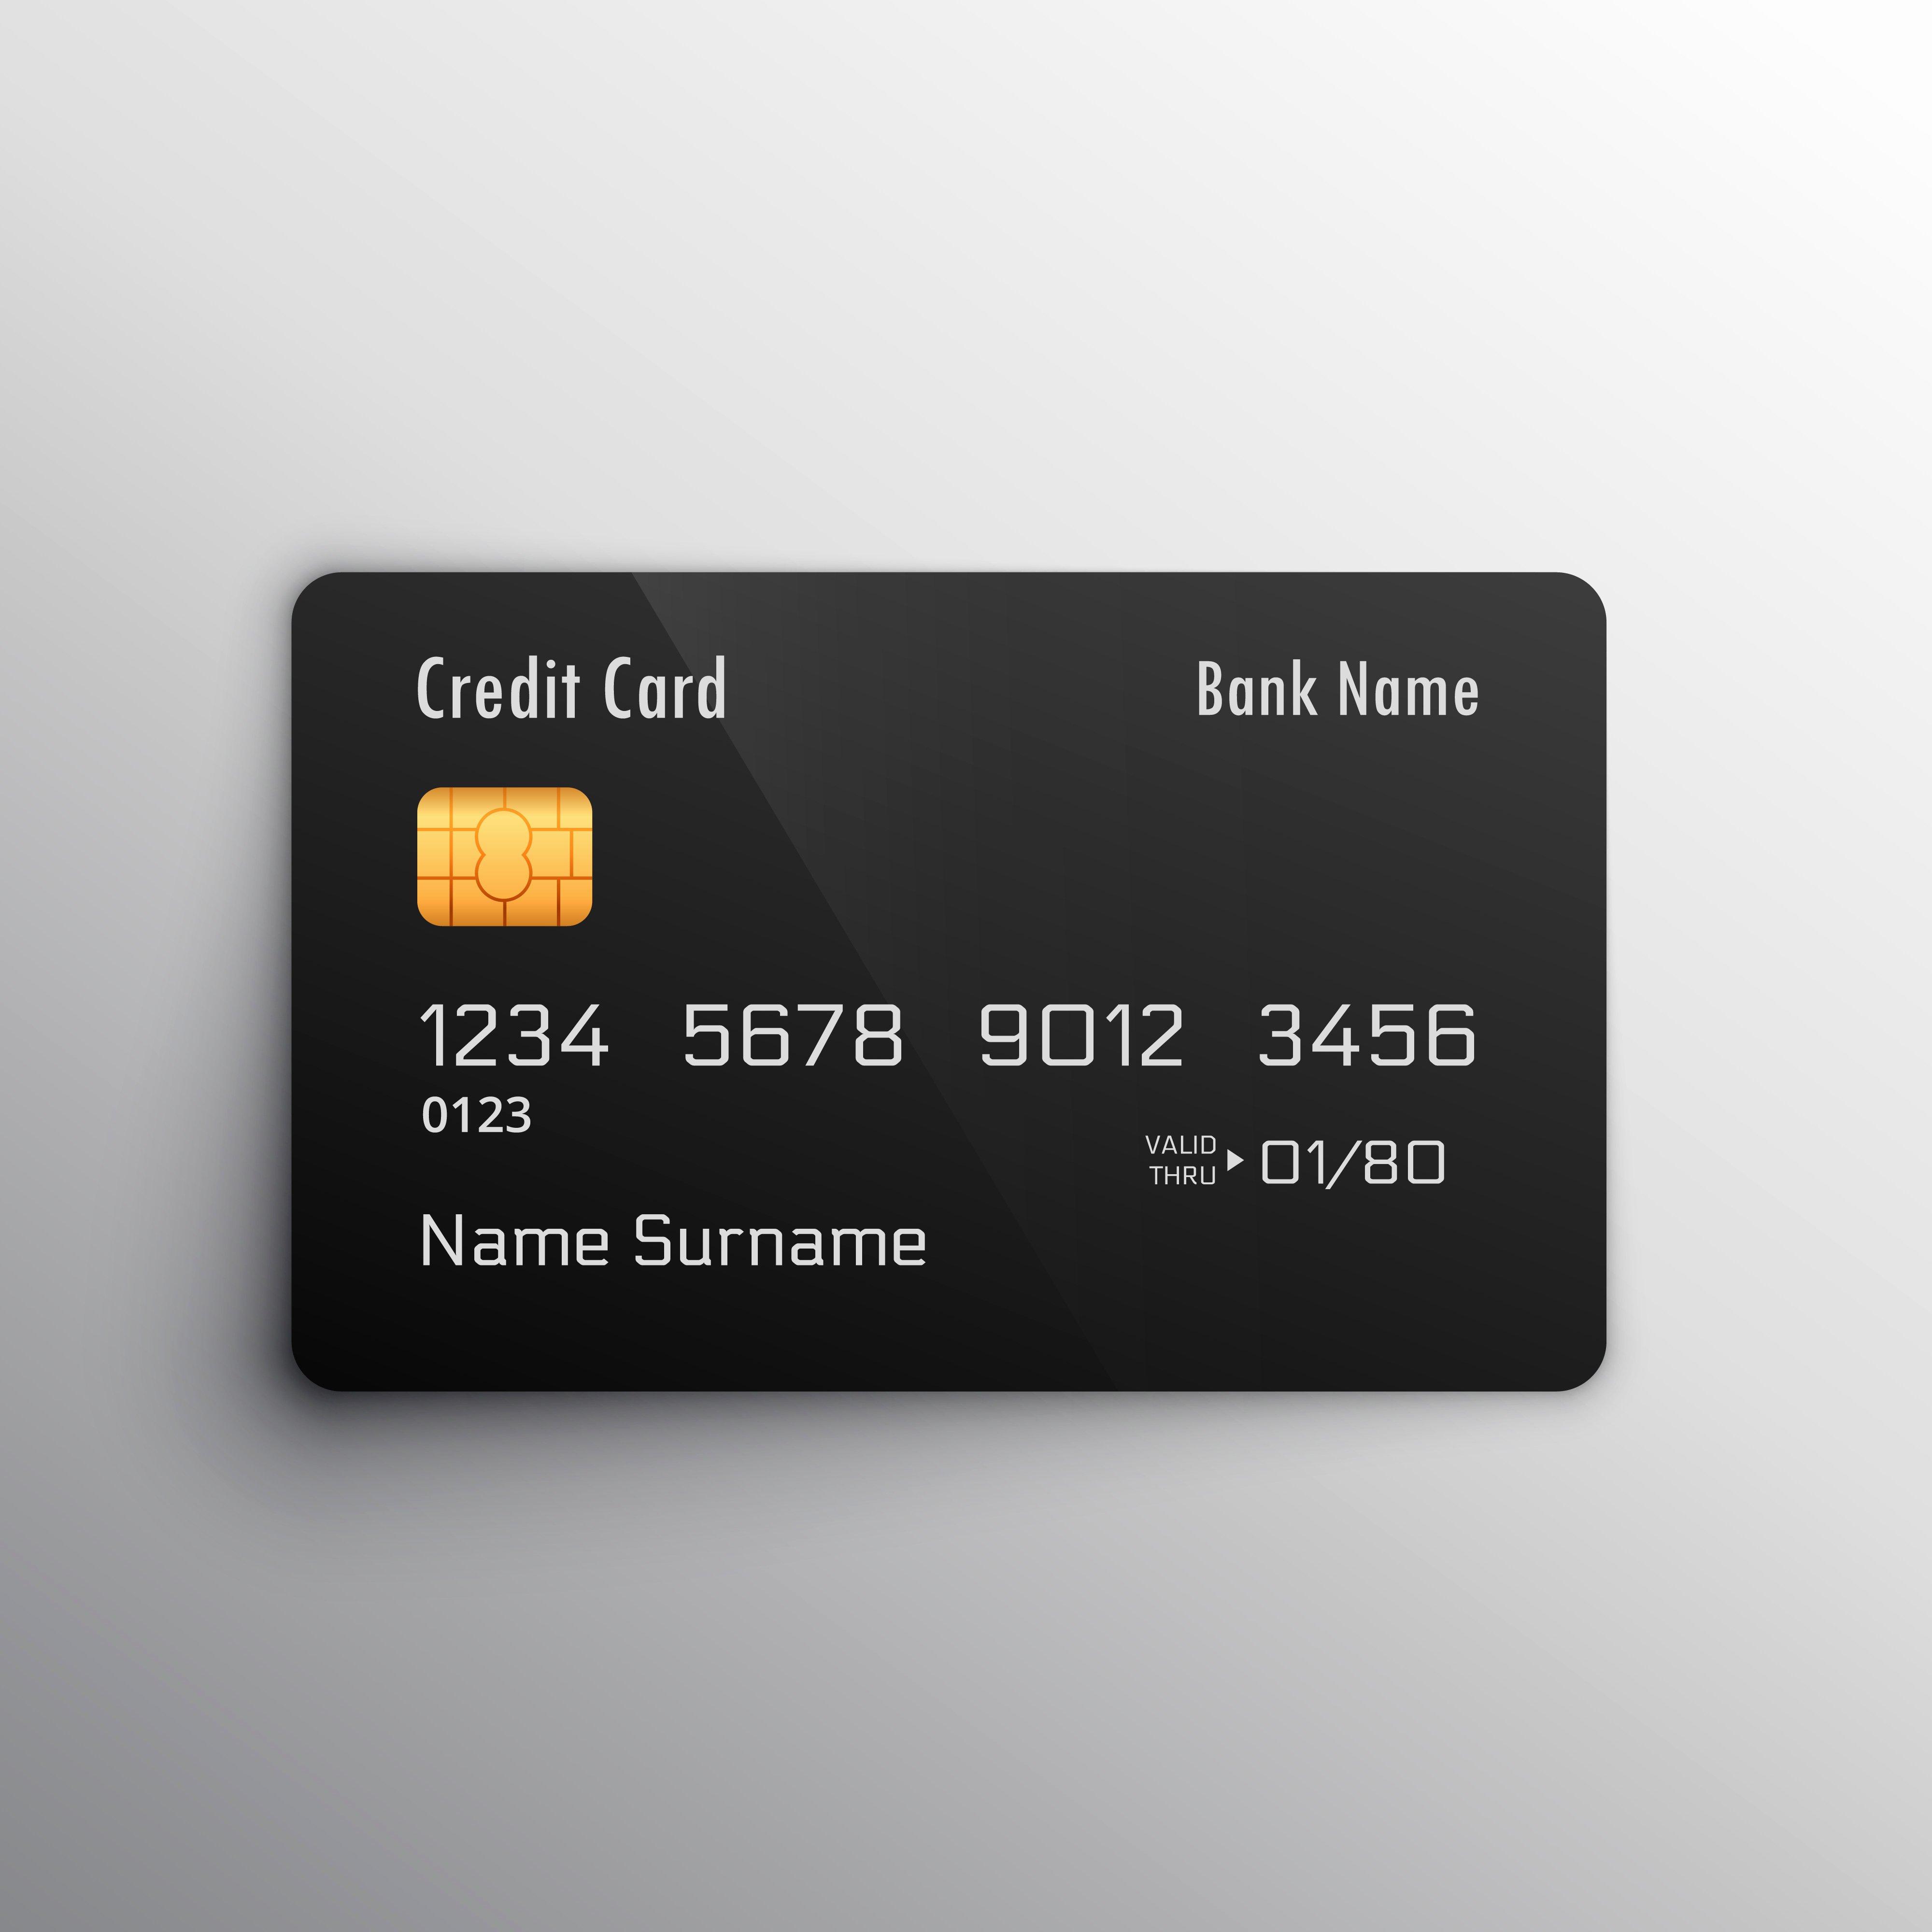 Visa Credit Card Template Best Of Credit Debit Card Mockup Download Free Vector Art Stock